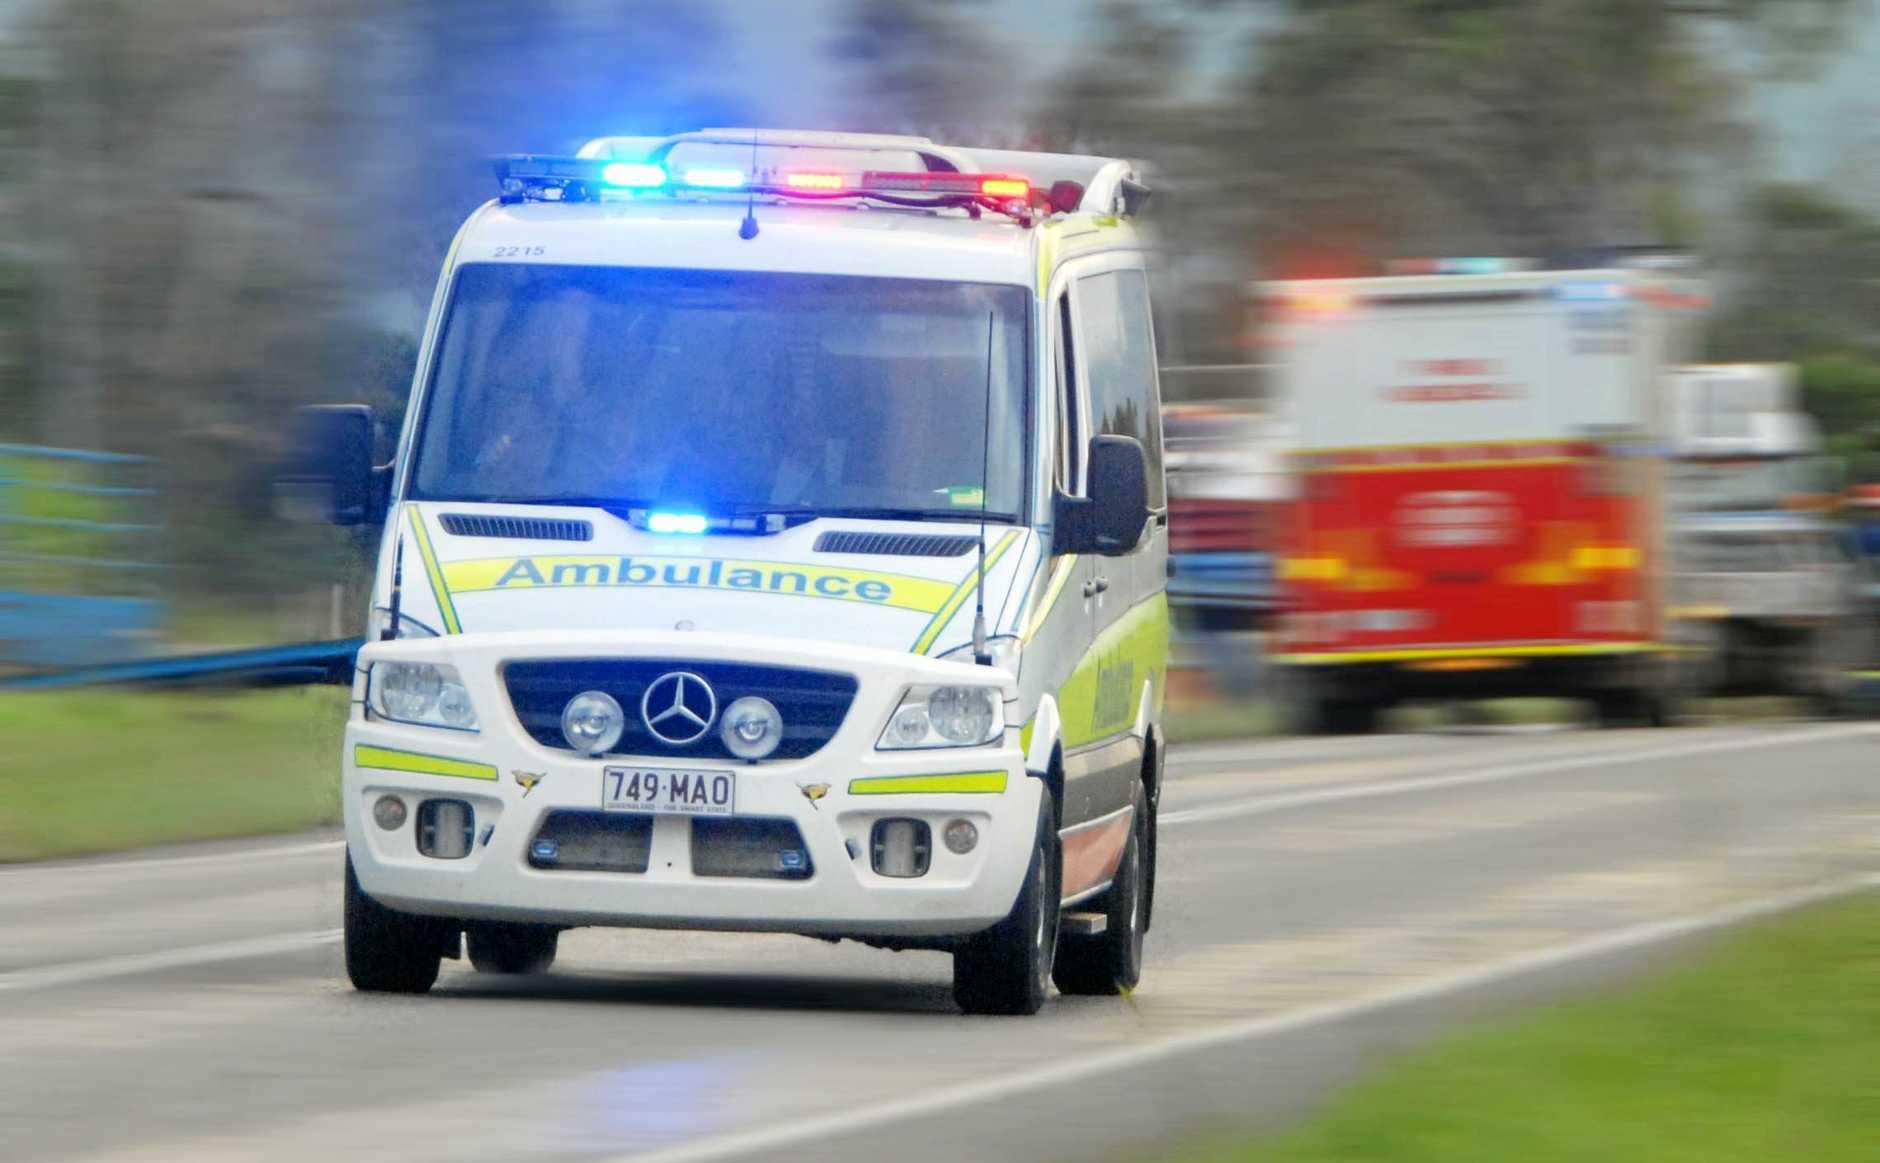 Three children suffered burns on the Sunshine Coast in 24 hours.